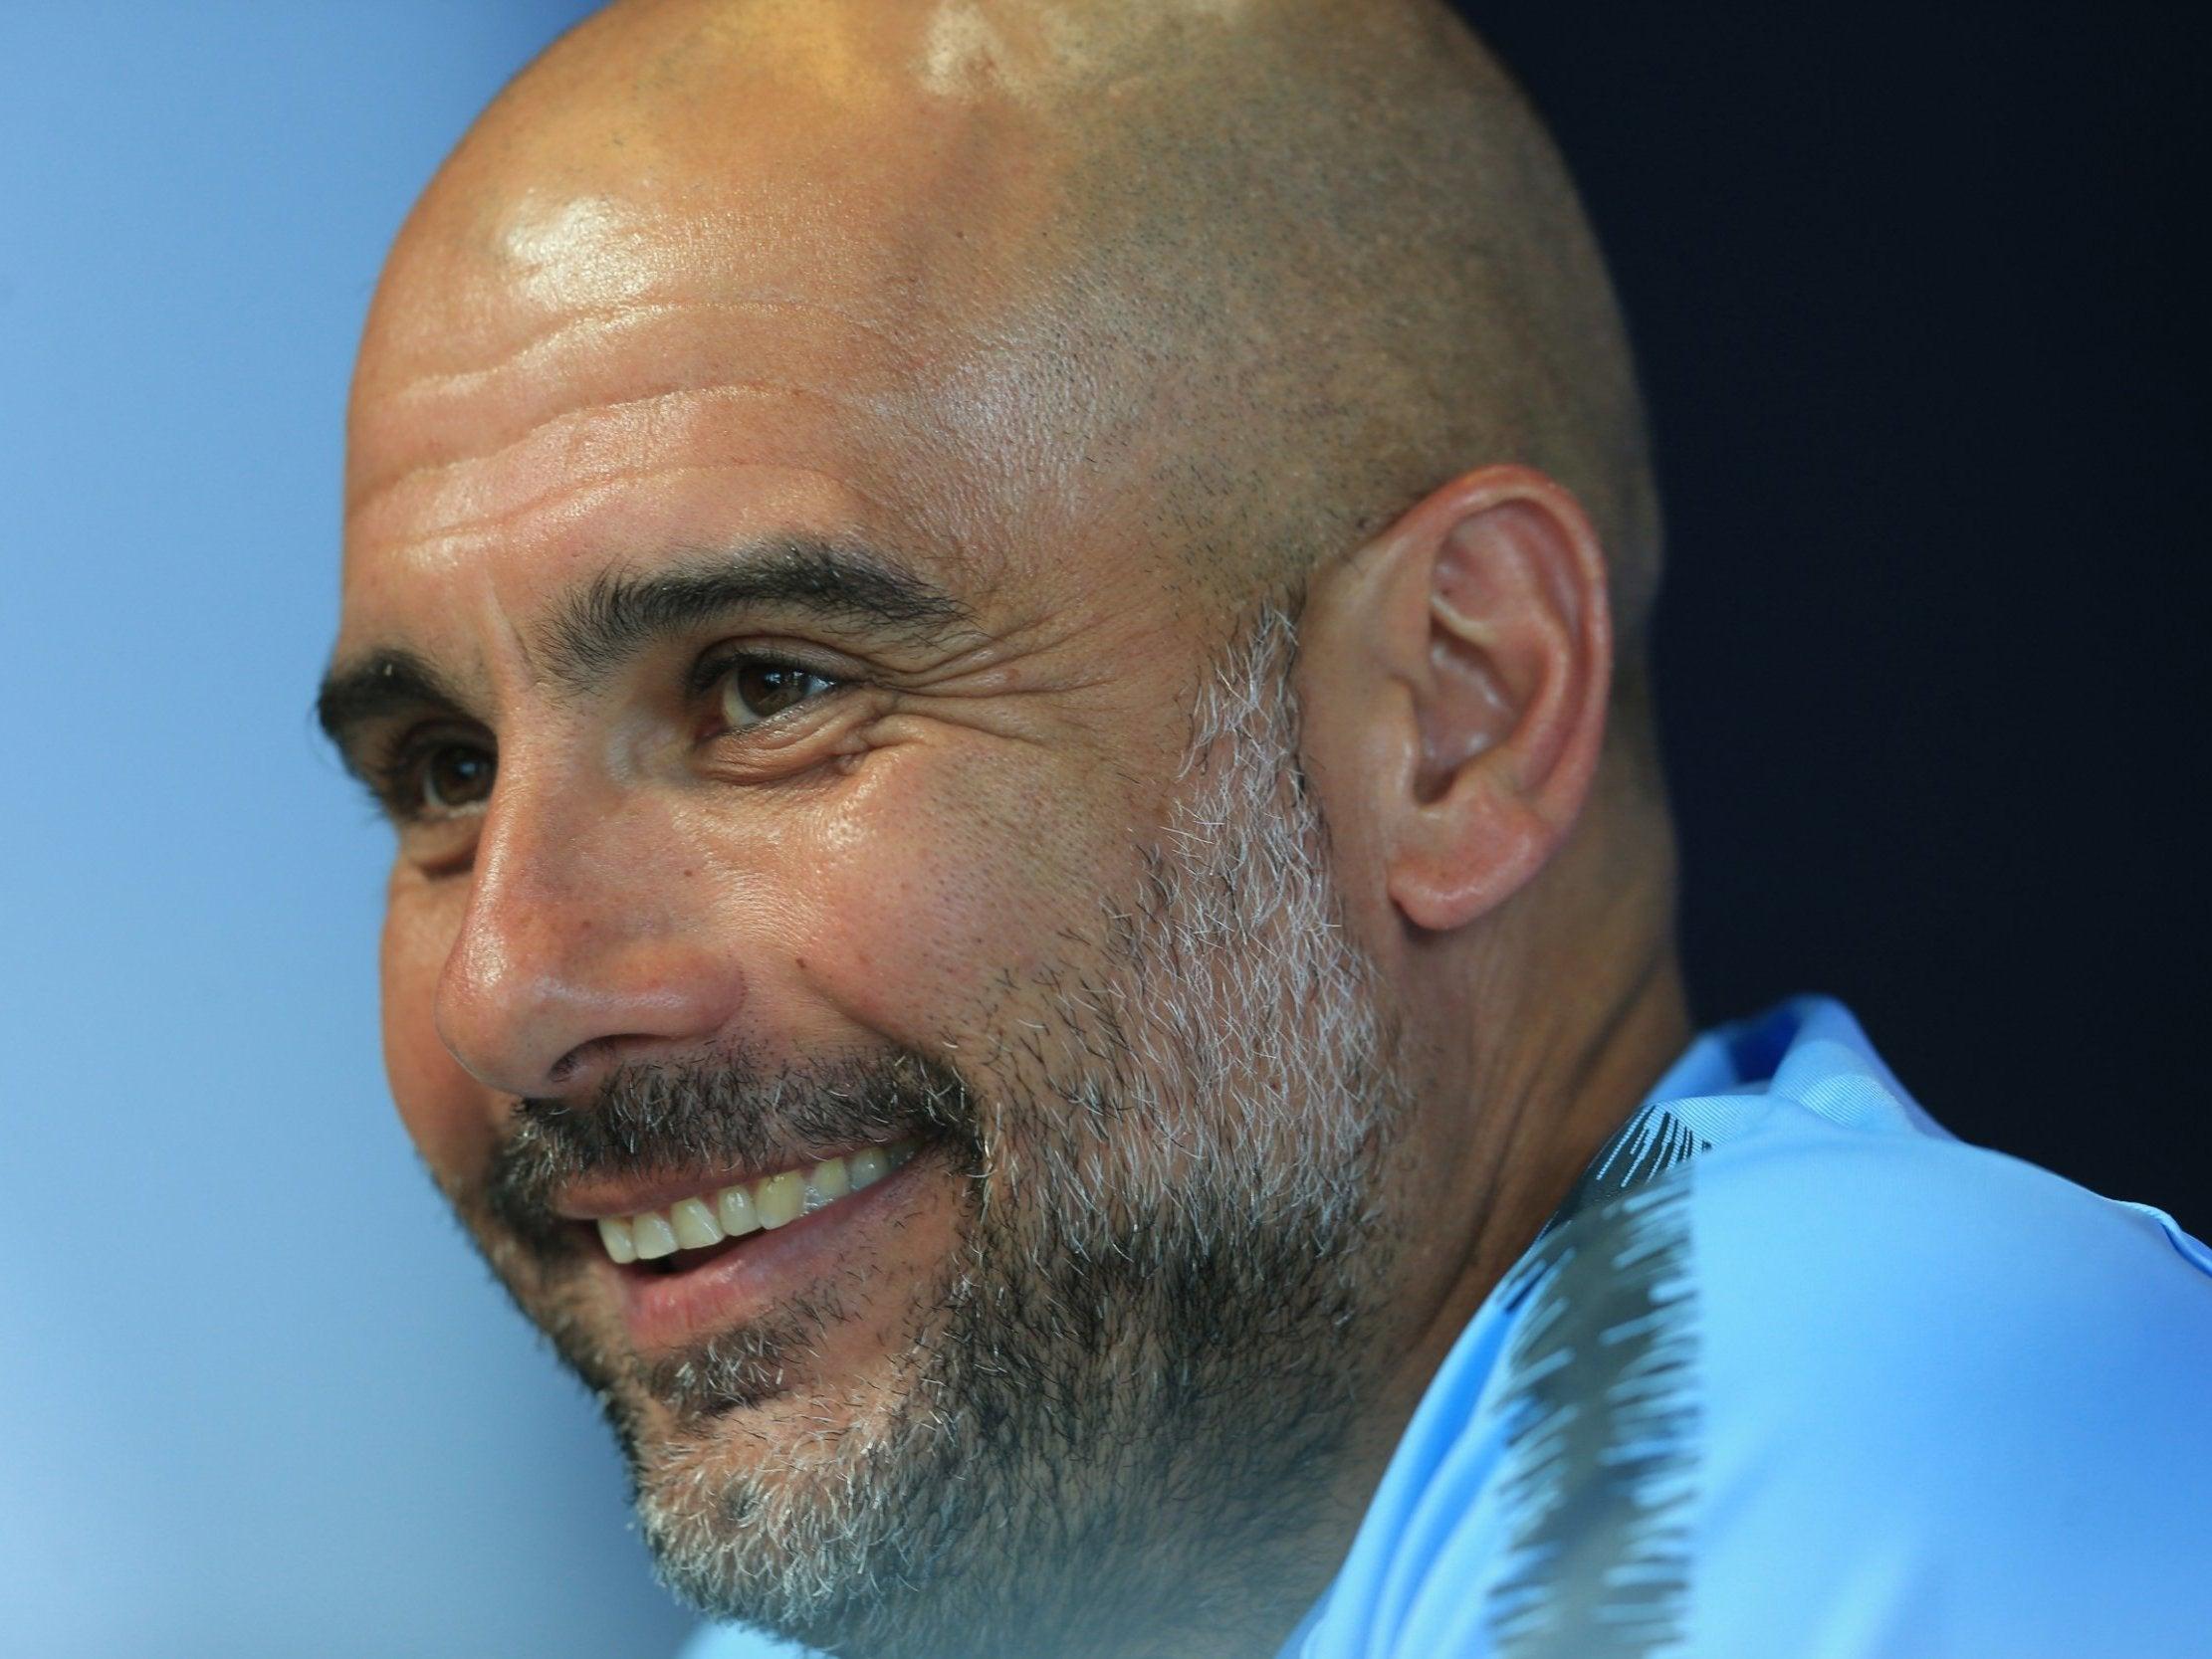 Manchester City: Pep Guardiola tells players to enjoy ...